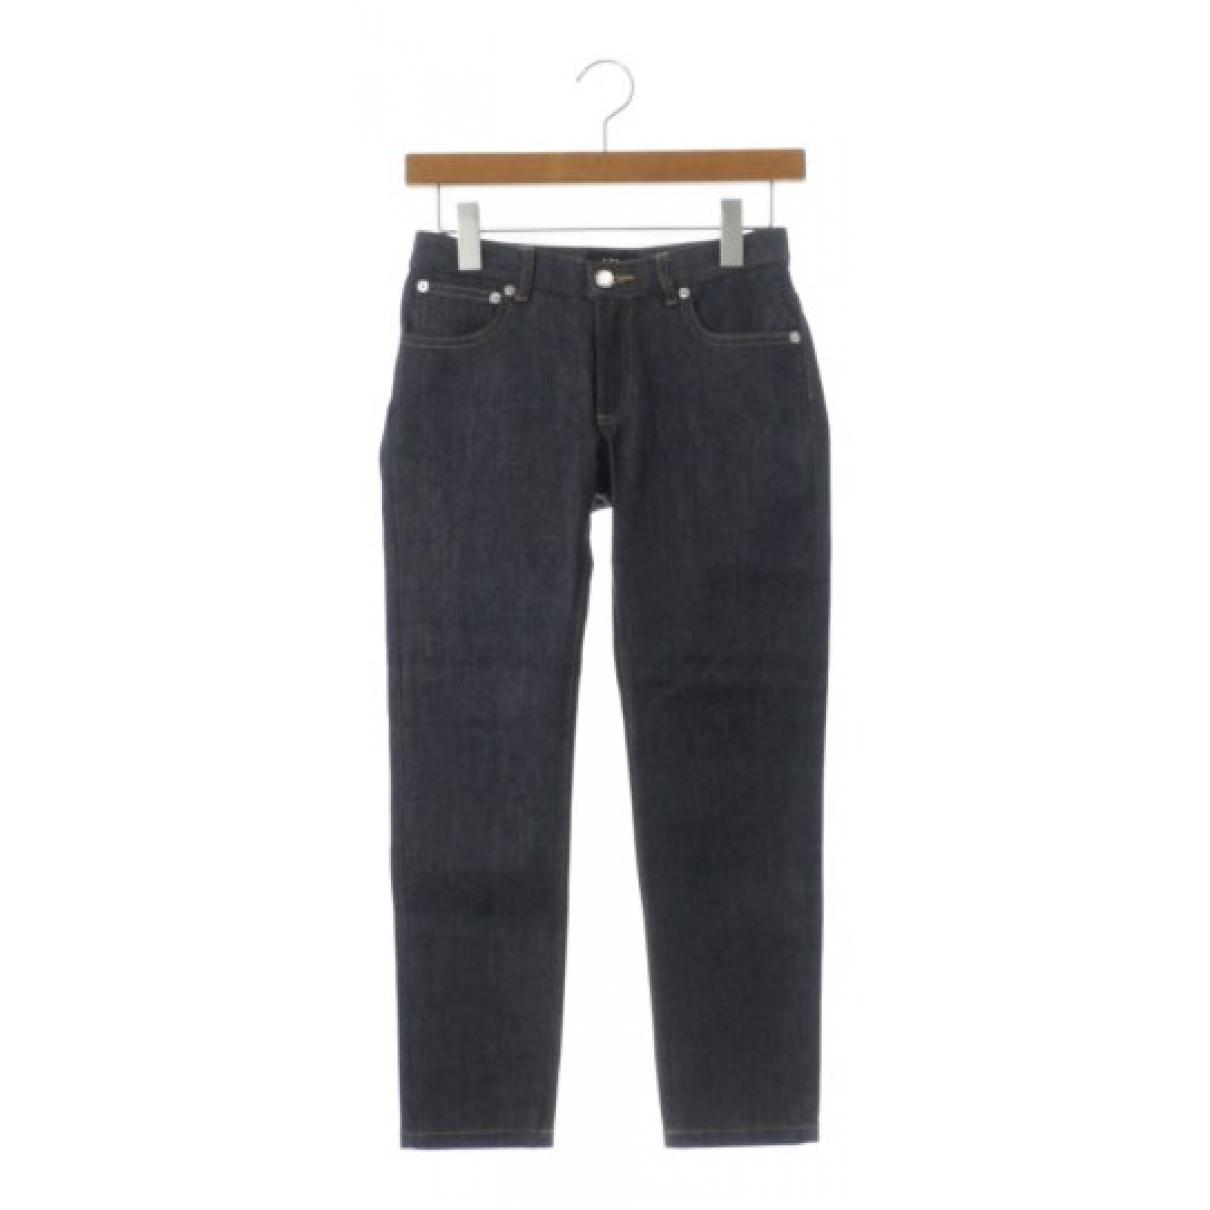 Apc \N Blue Denim - Jeans Jeans for Women 24 US